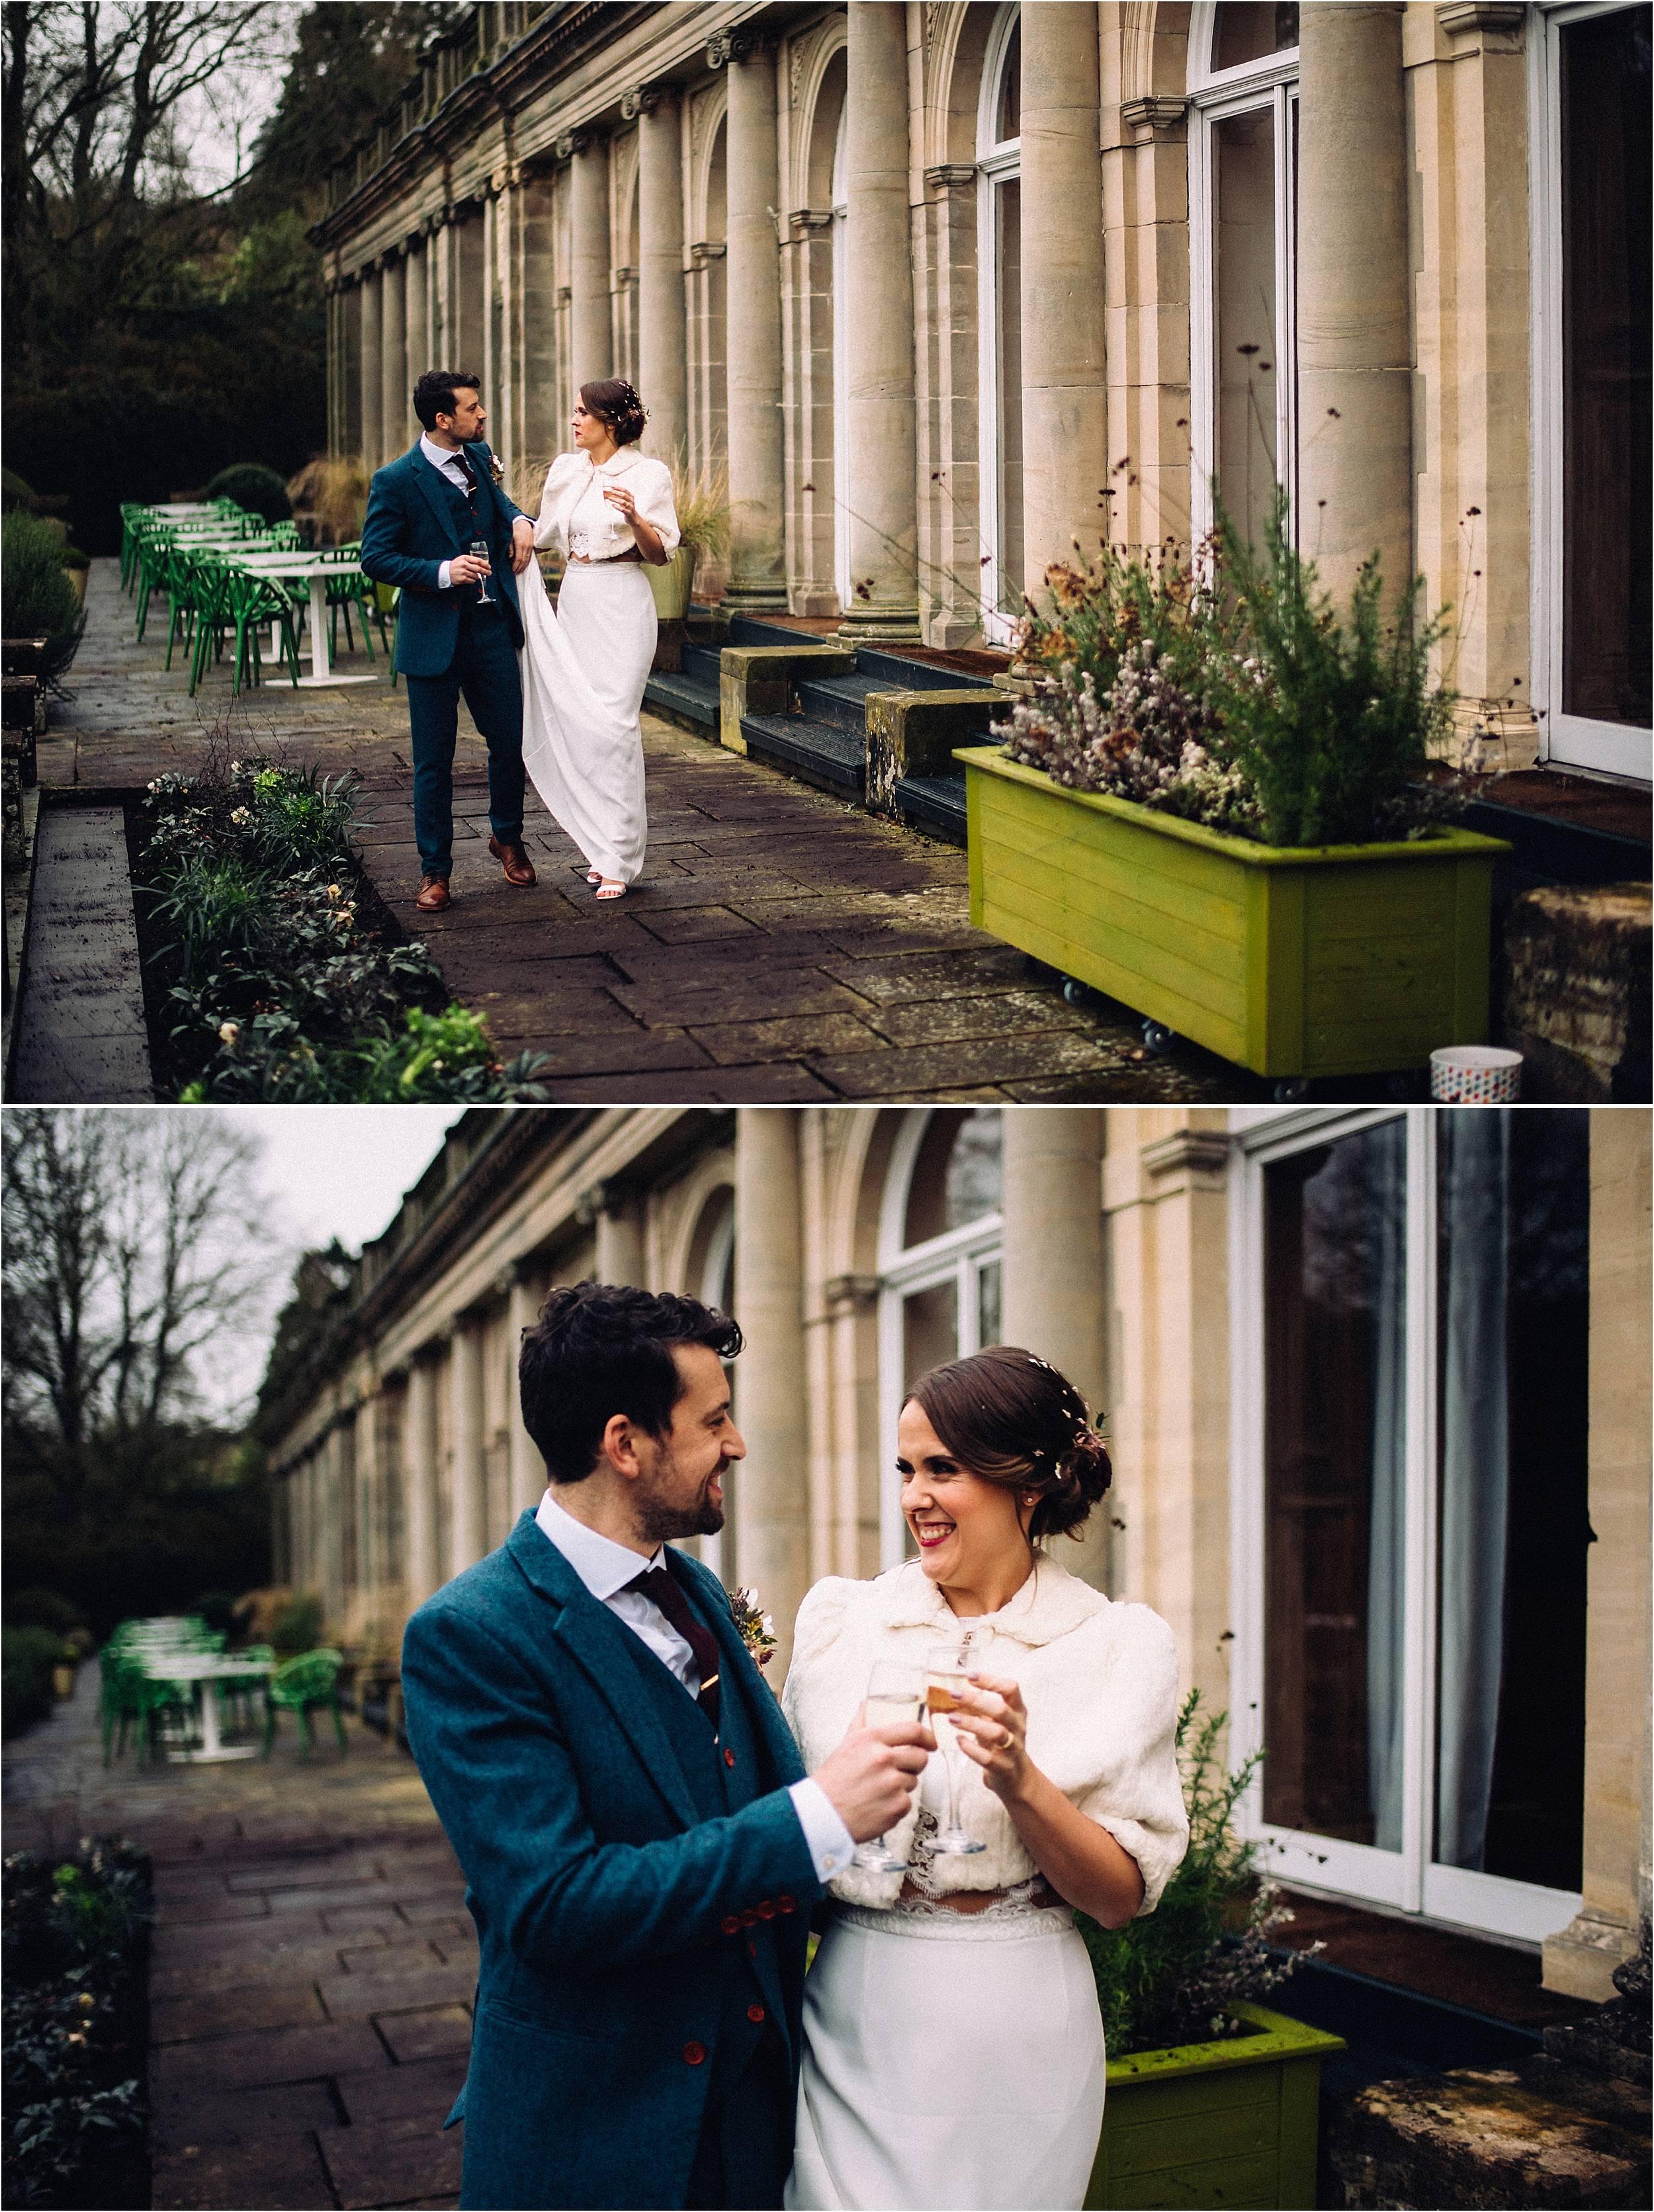 Cowley Manor Cotswolds Wedding Photographer_0078.jpg